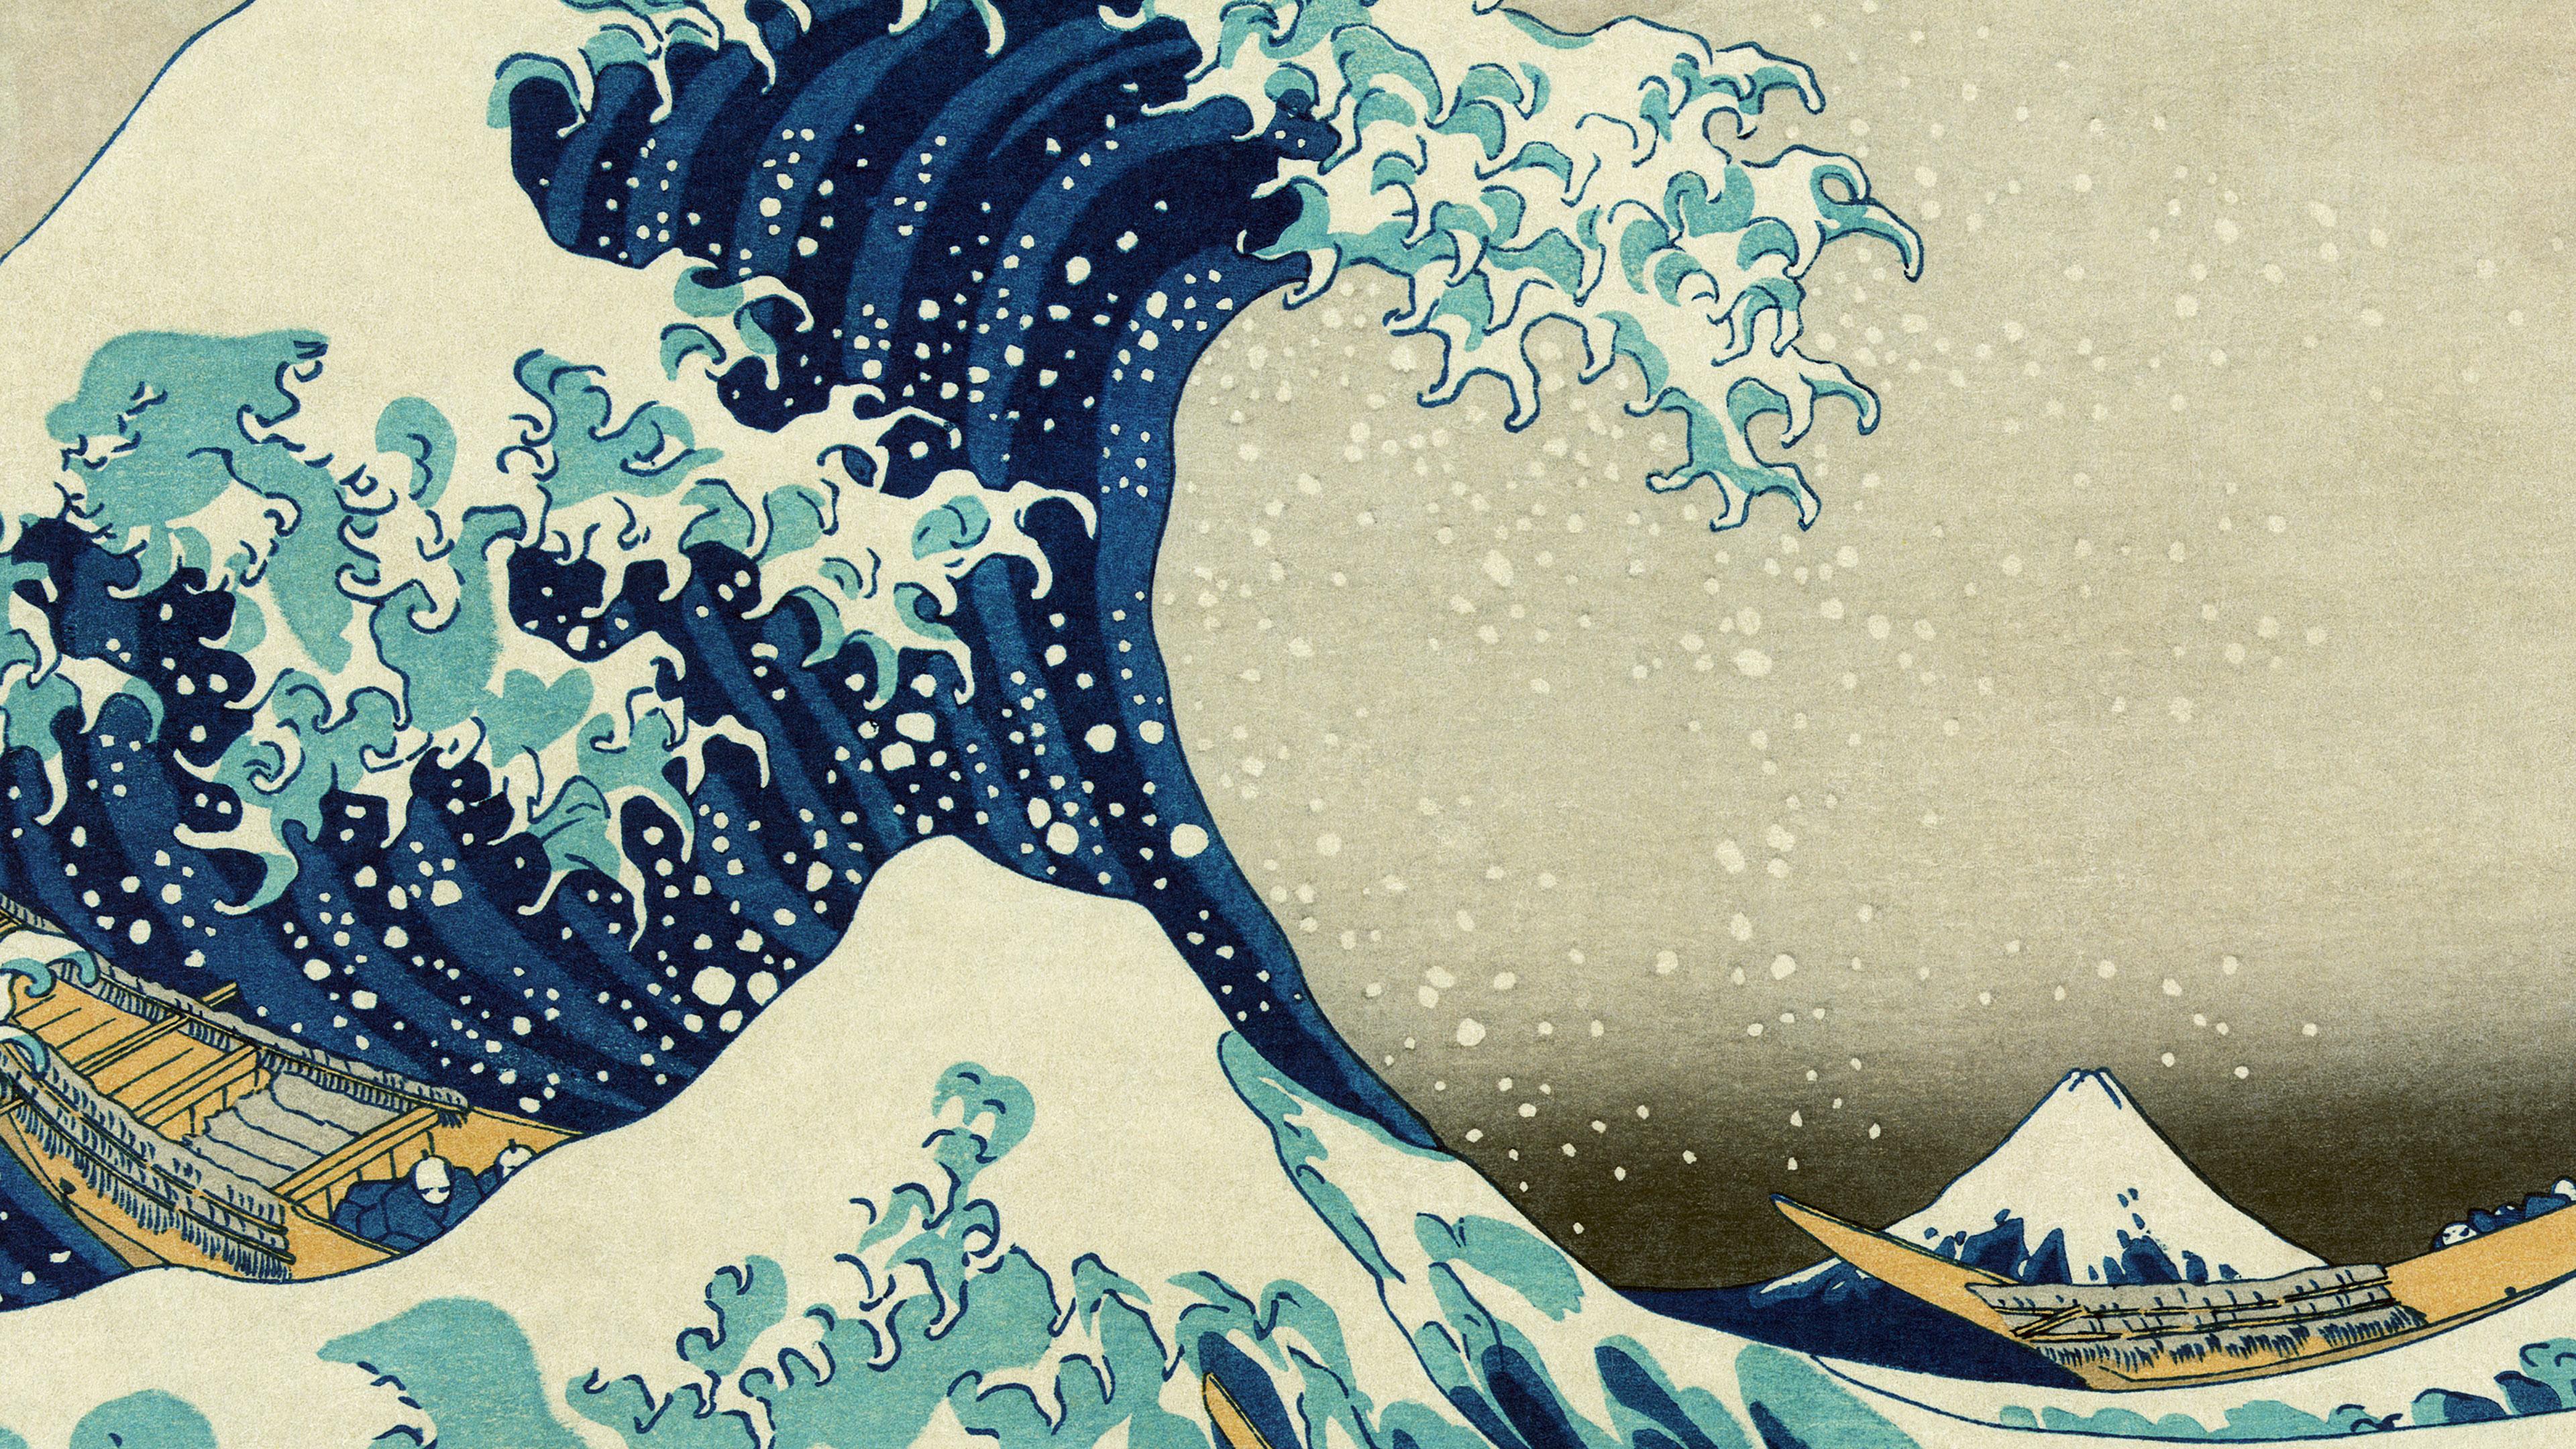 Ab75 Wallpaper Great Wave Off Kanagawa Wallpaper